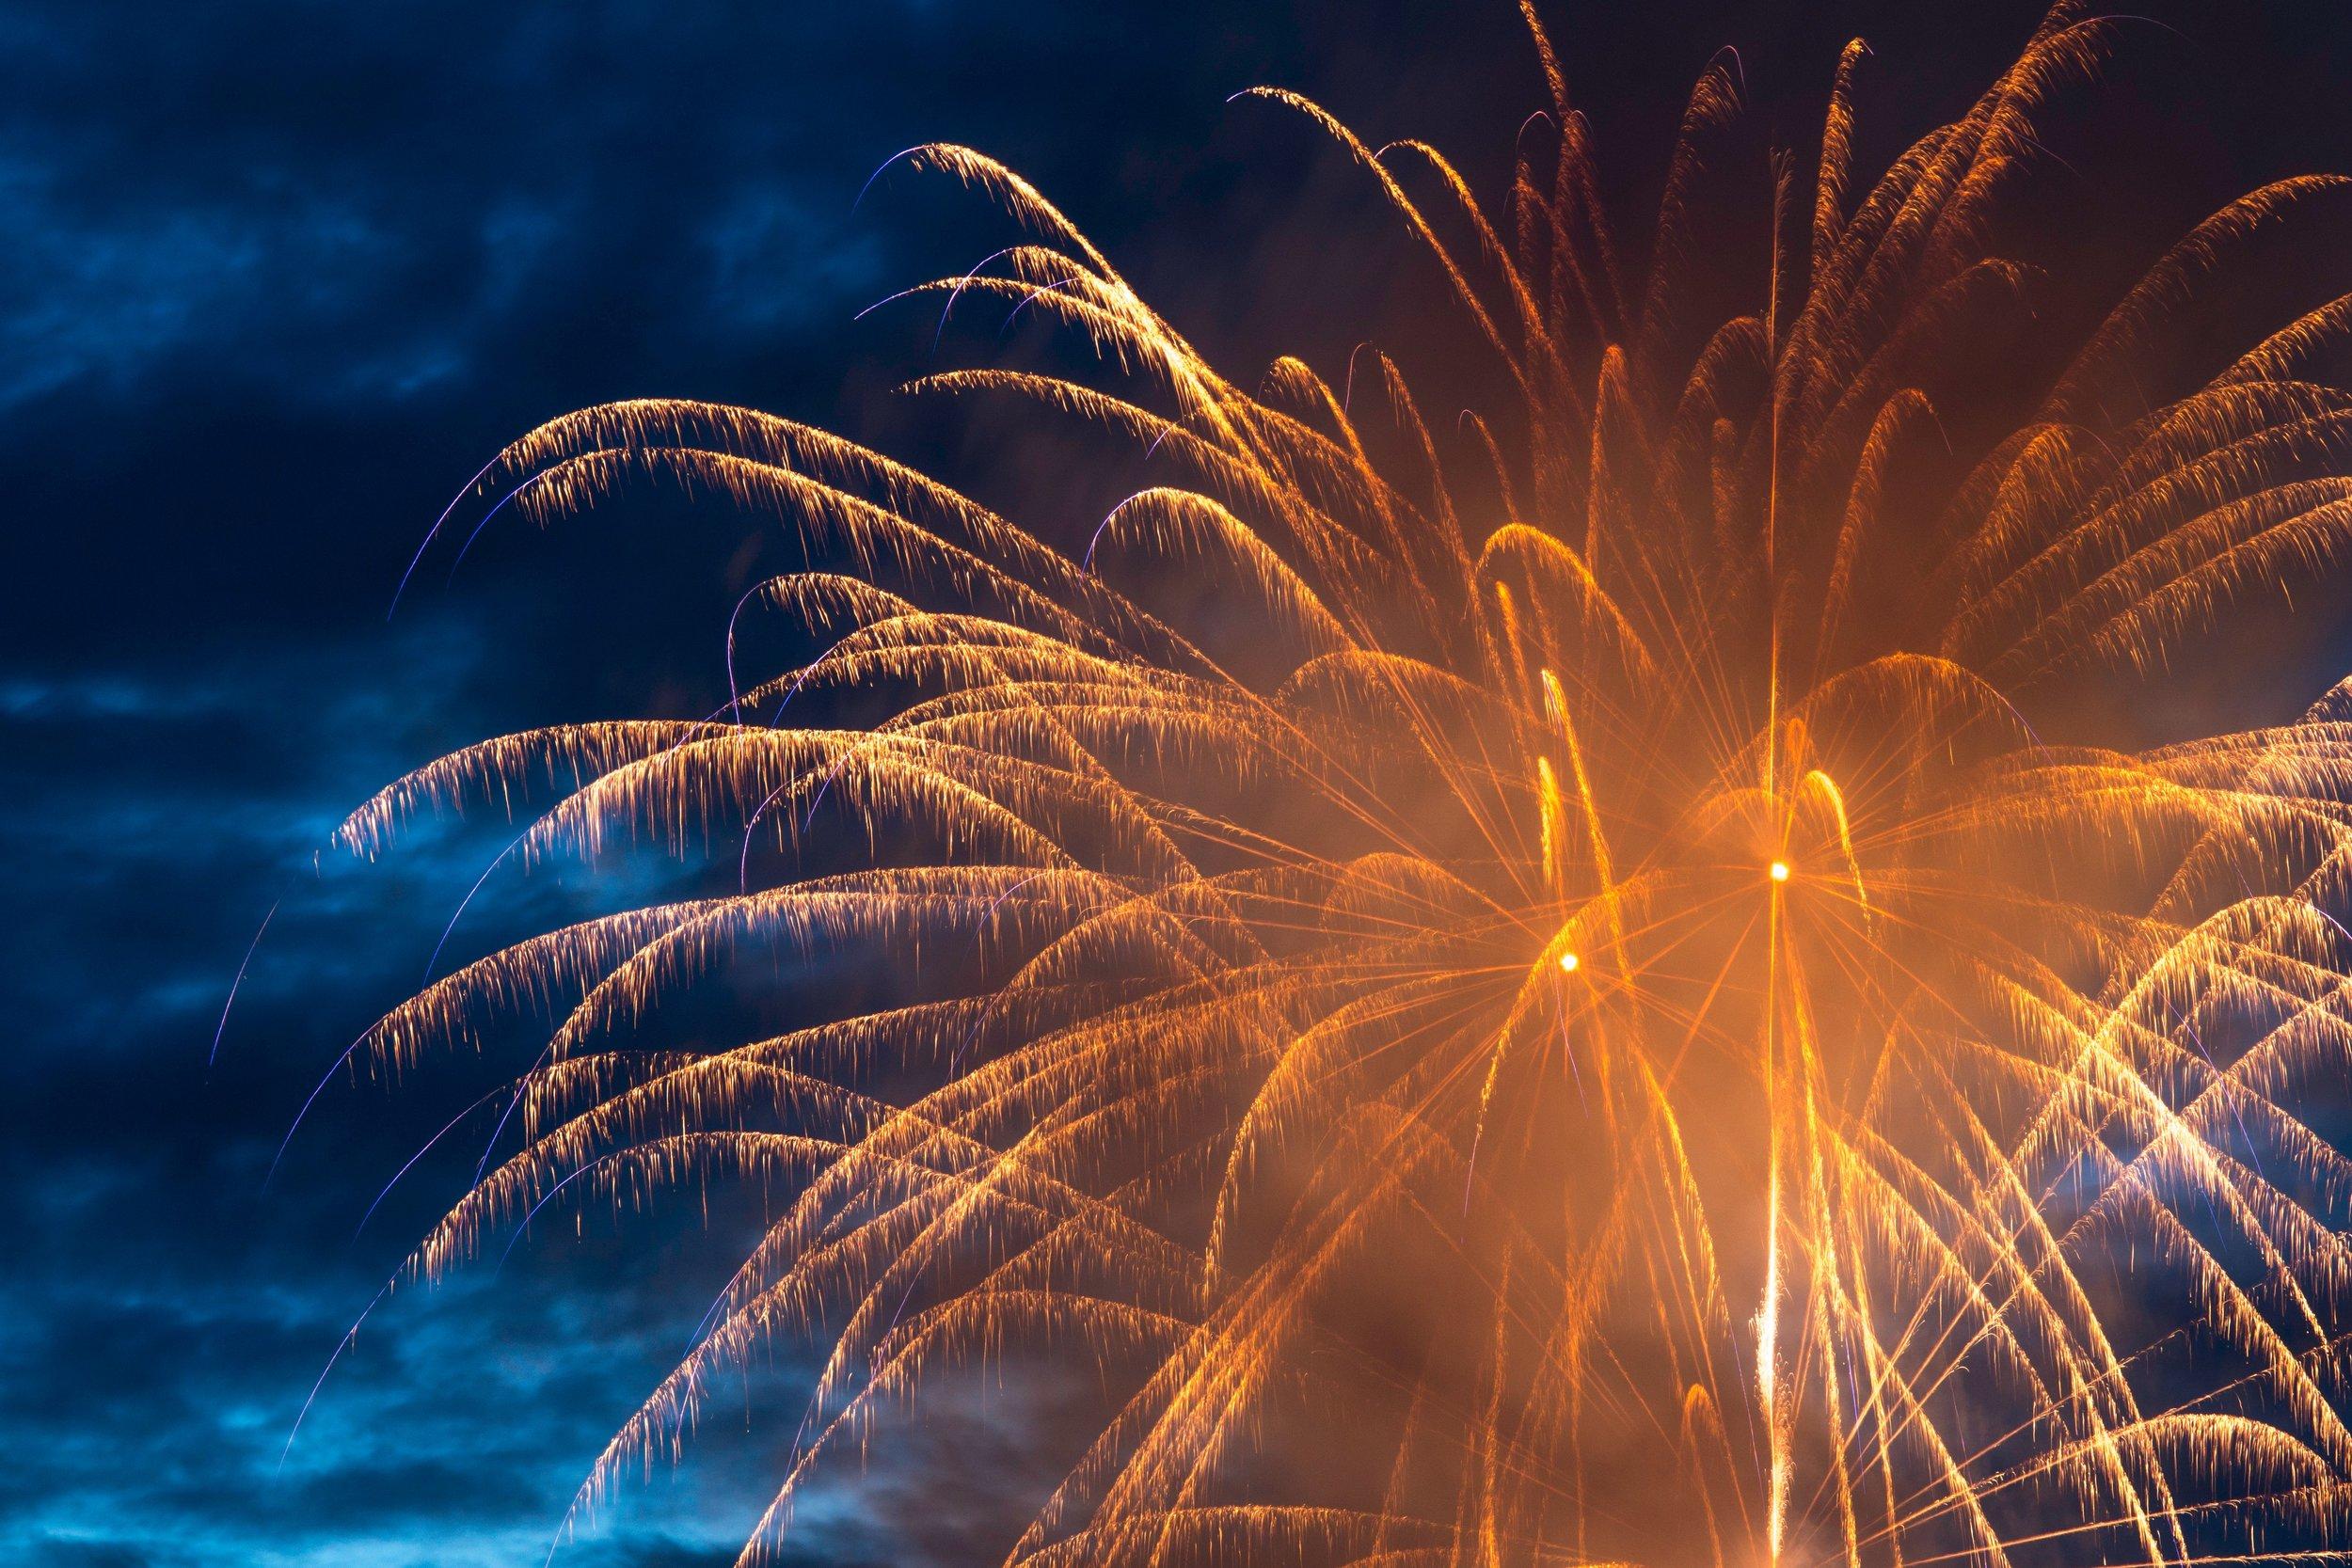 bright-celebration-clouds-613366.jpg